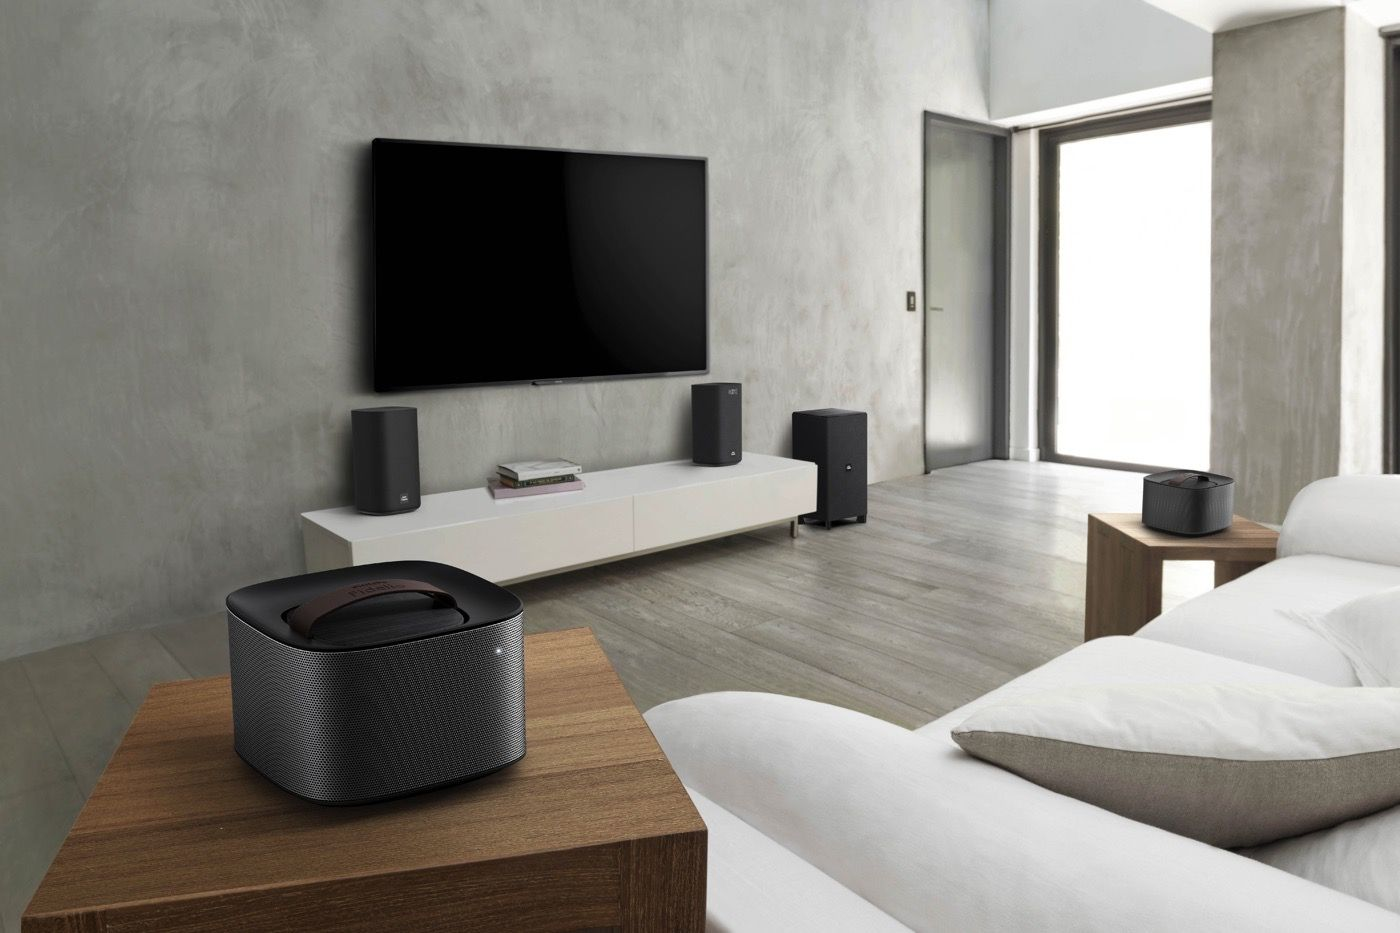 Philips Living Room Audio Gear Includes Detachable Speakers Huis